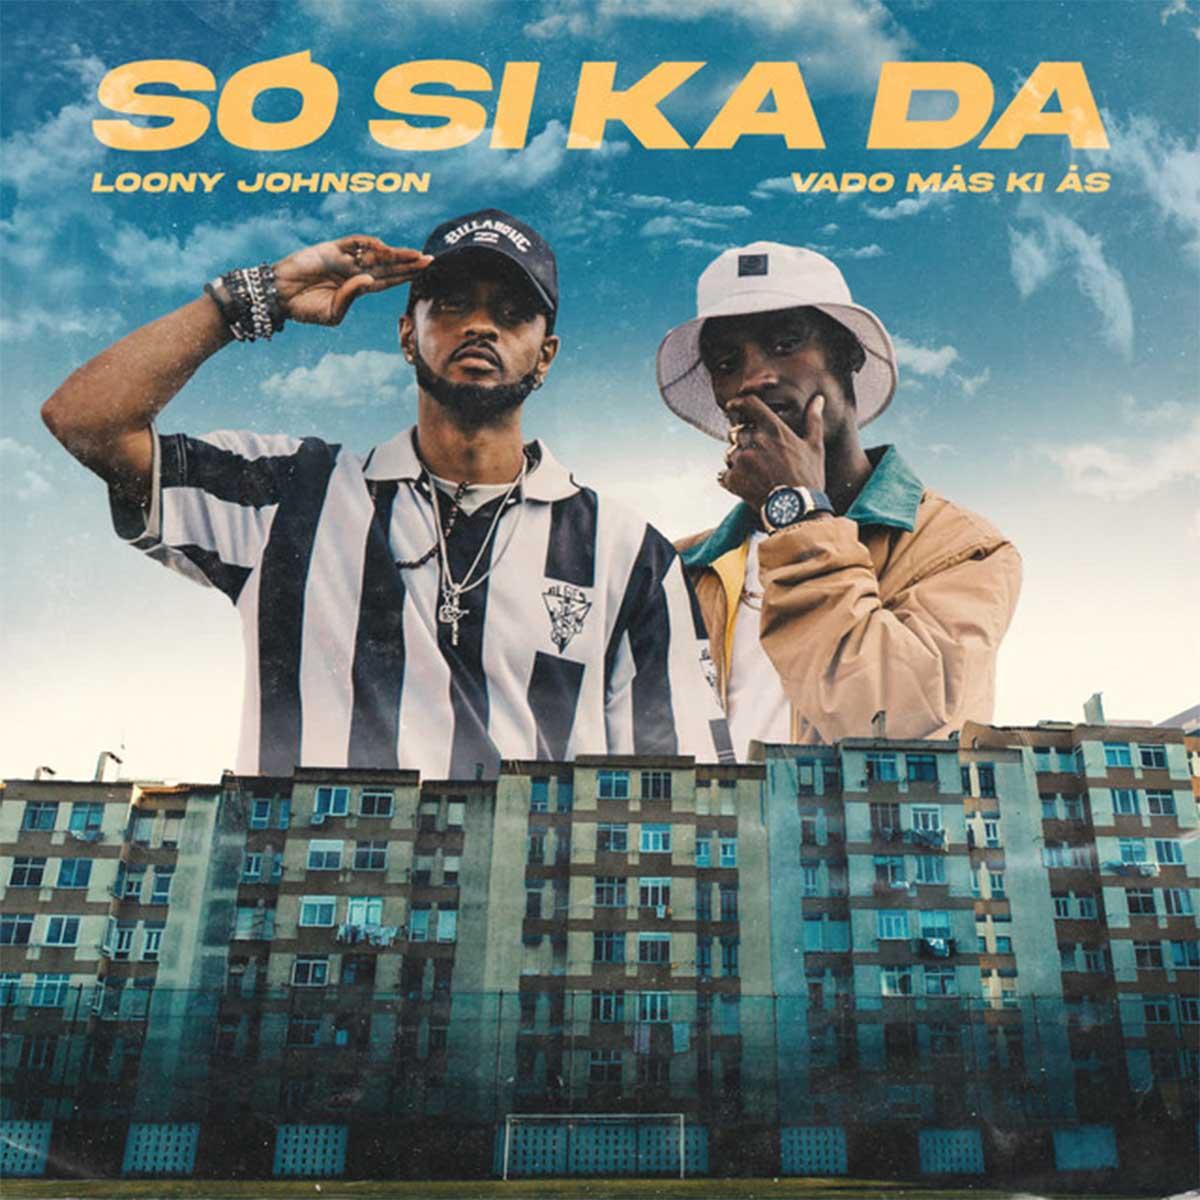 Loony Johnson - Só Si Ka Da (feat. Vado Más Ki Ás)